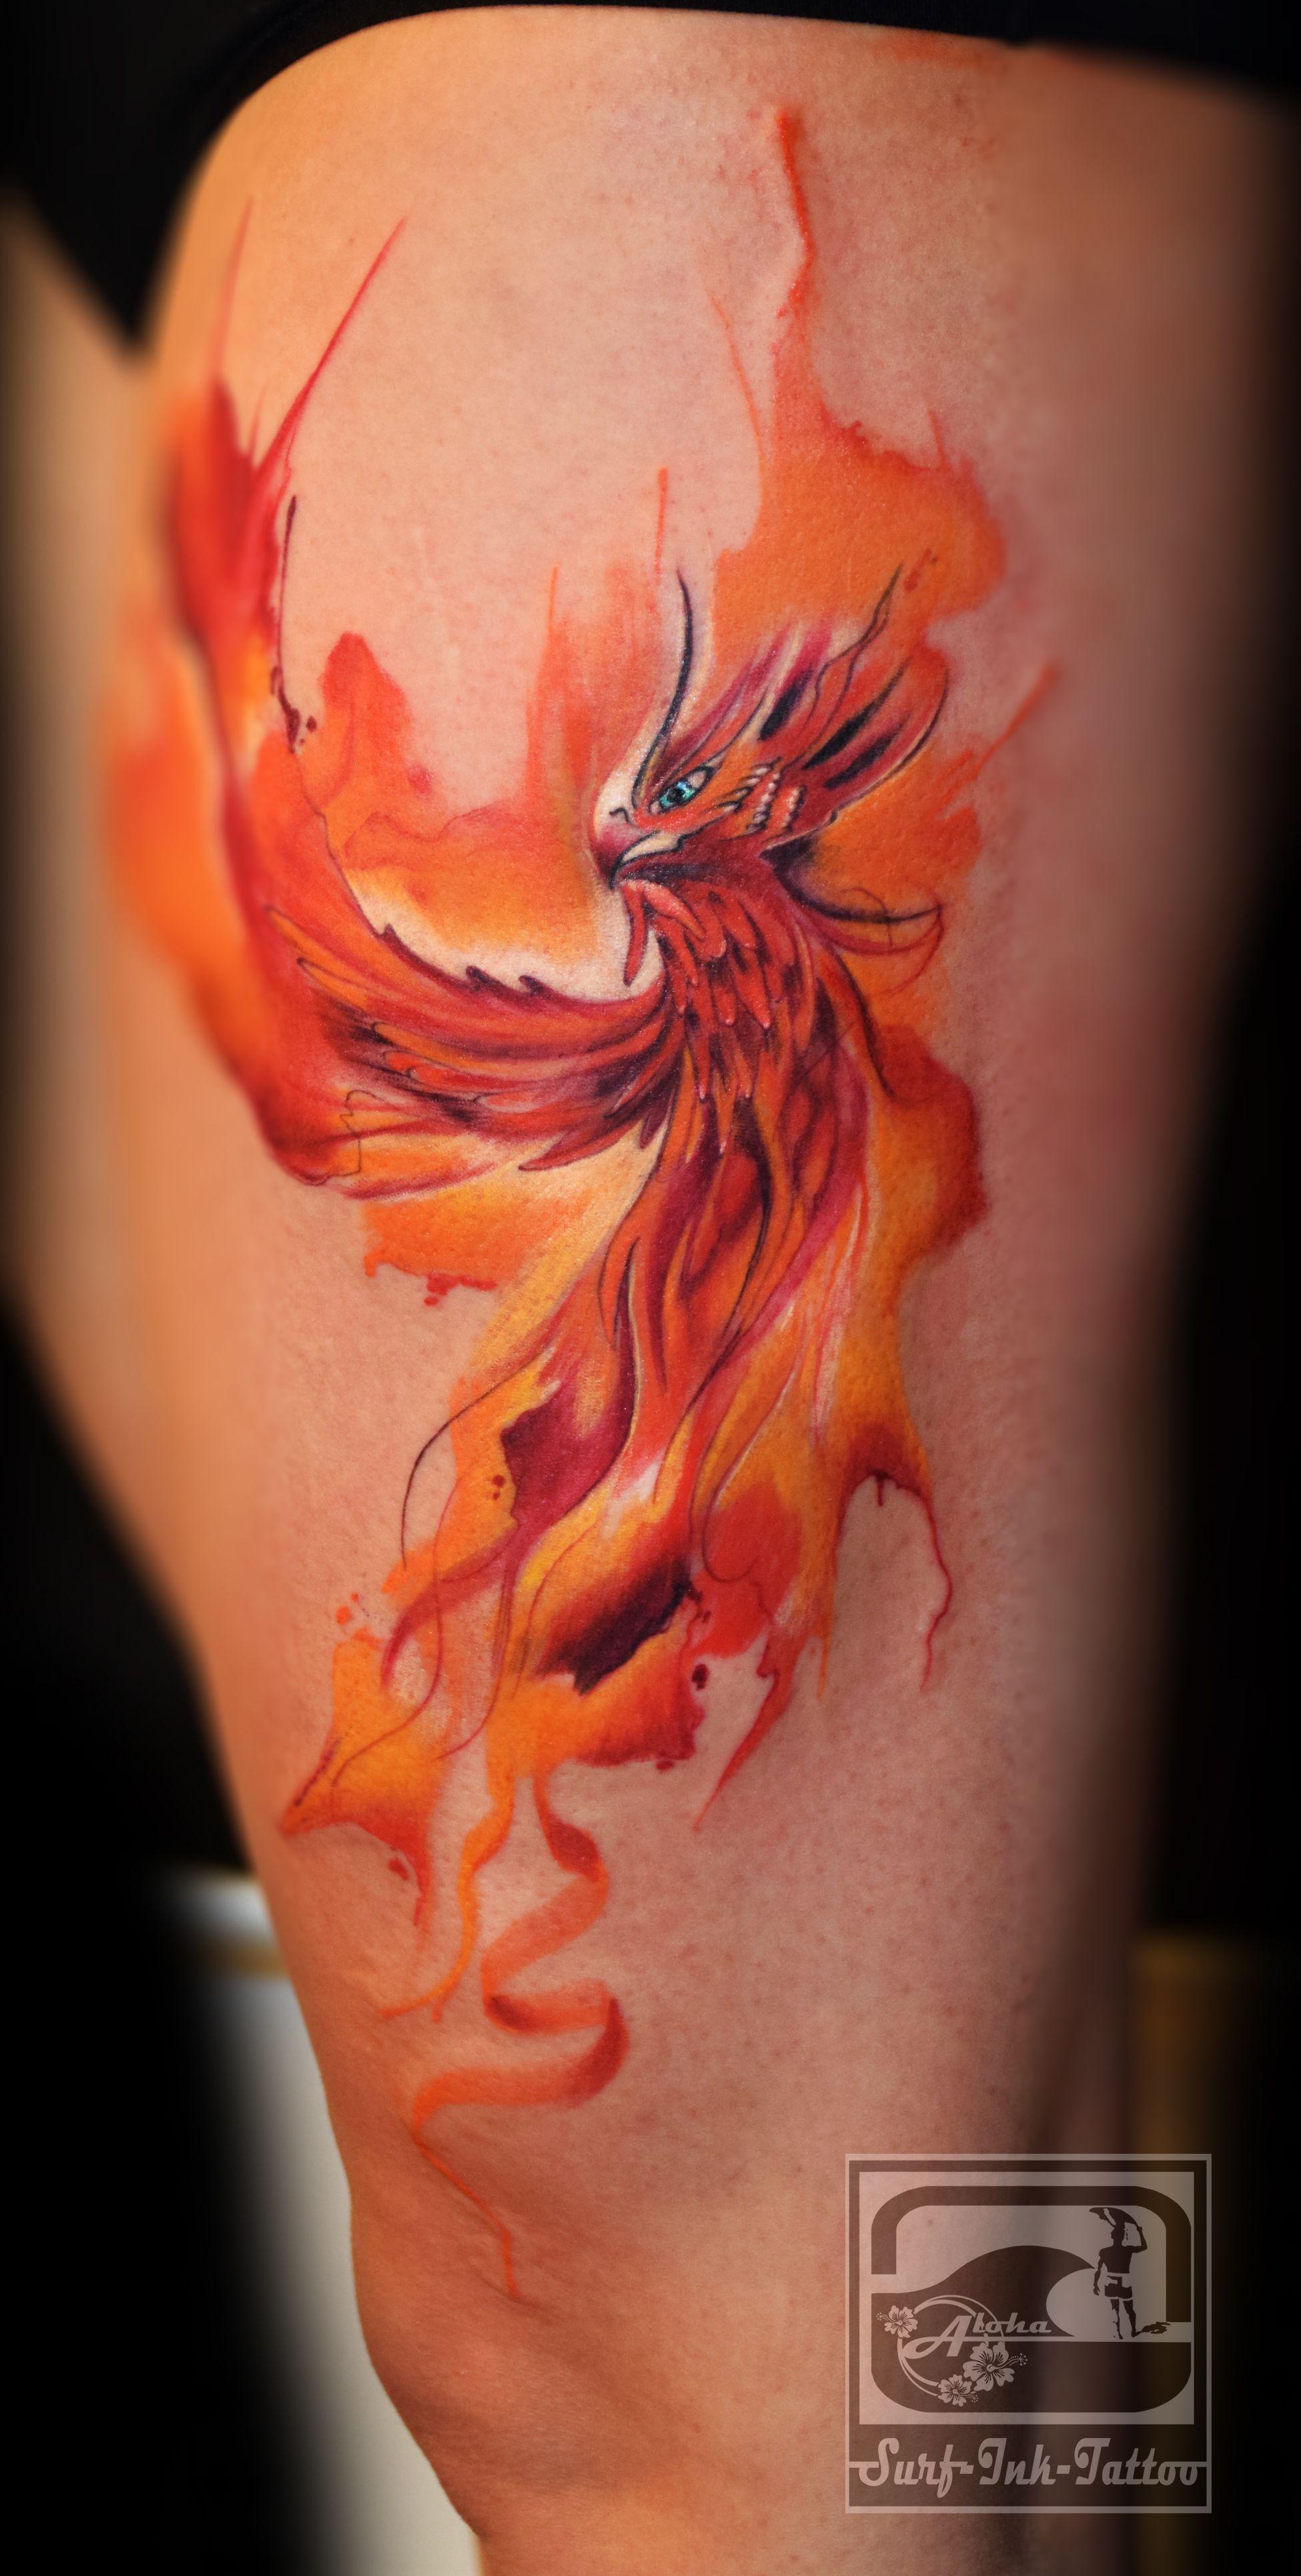 Watermark Watercolor Background Tattoo